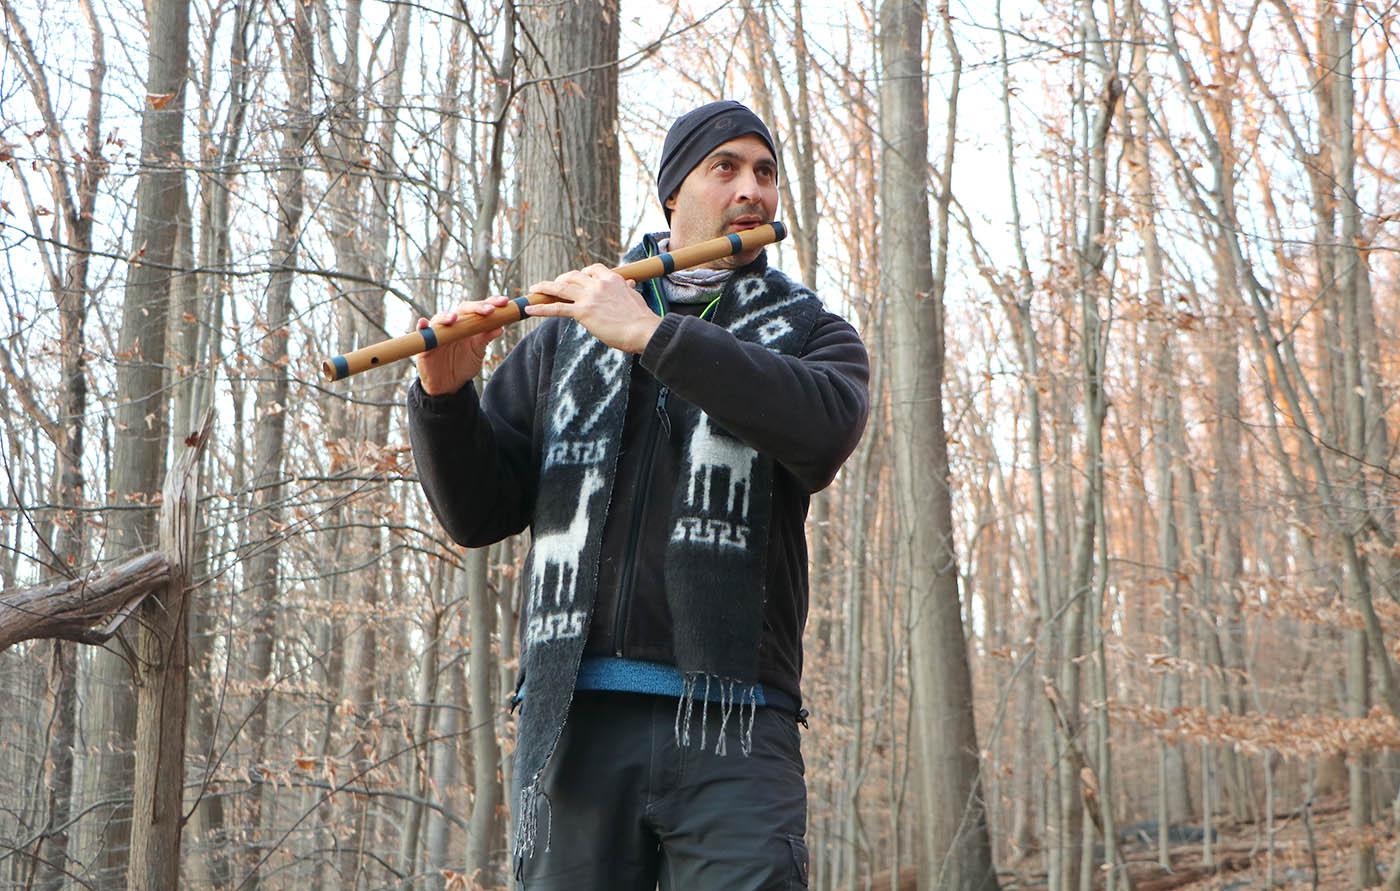 USA MD Appalachian Trail Bansuri Kerry Kriger